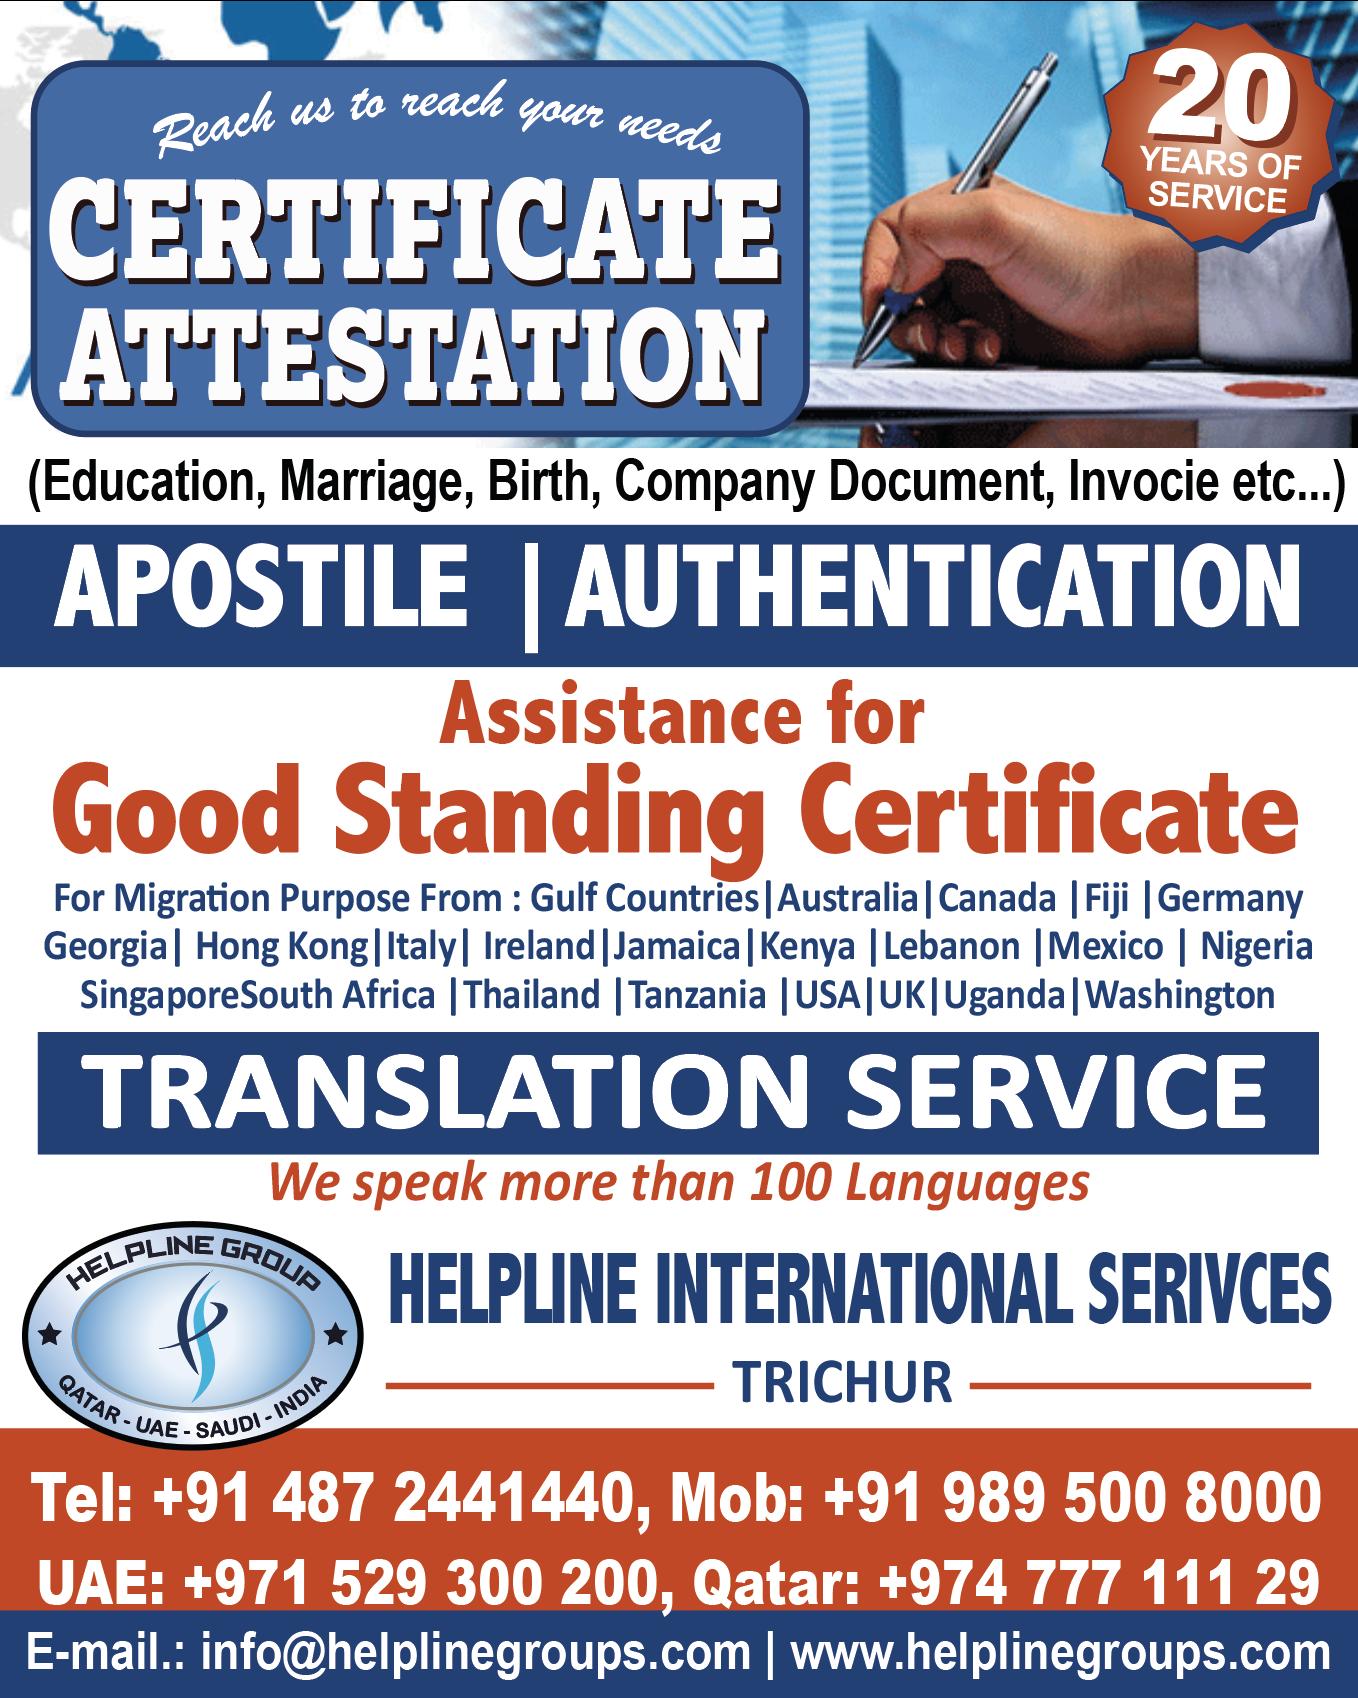 Image for Helpline international services trichur